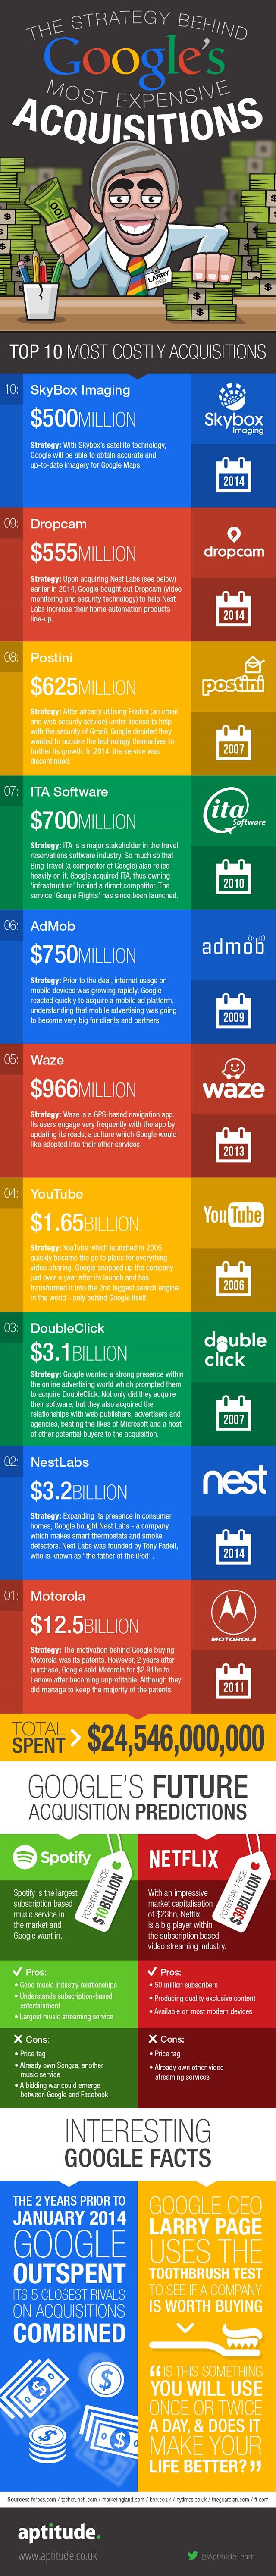 google-acquisitions